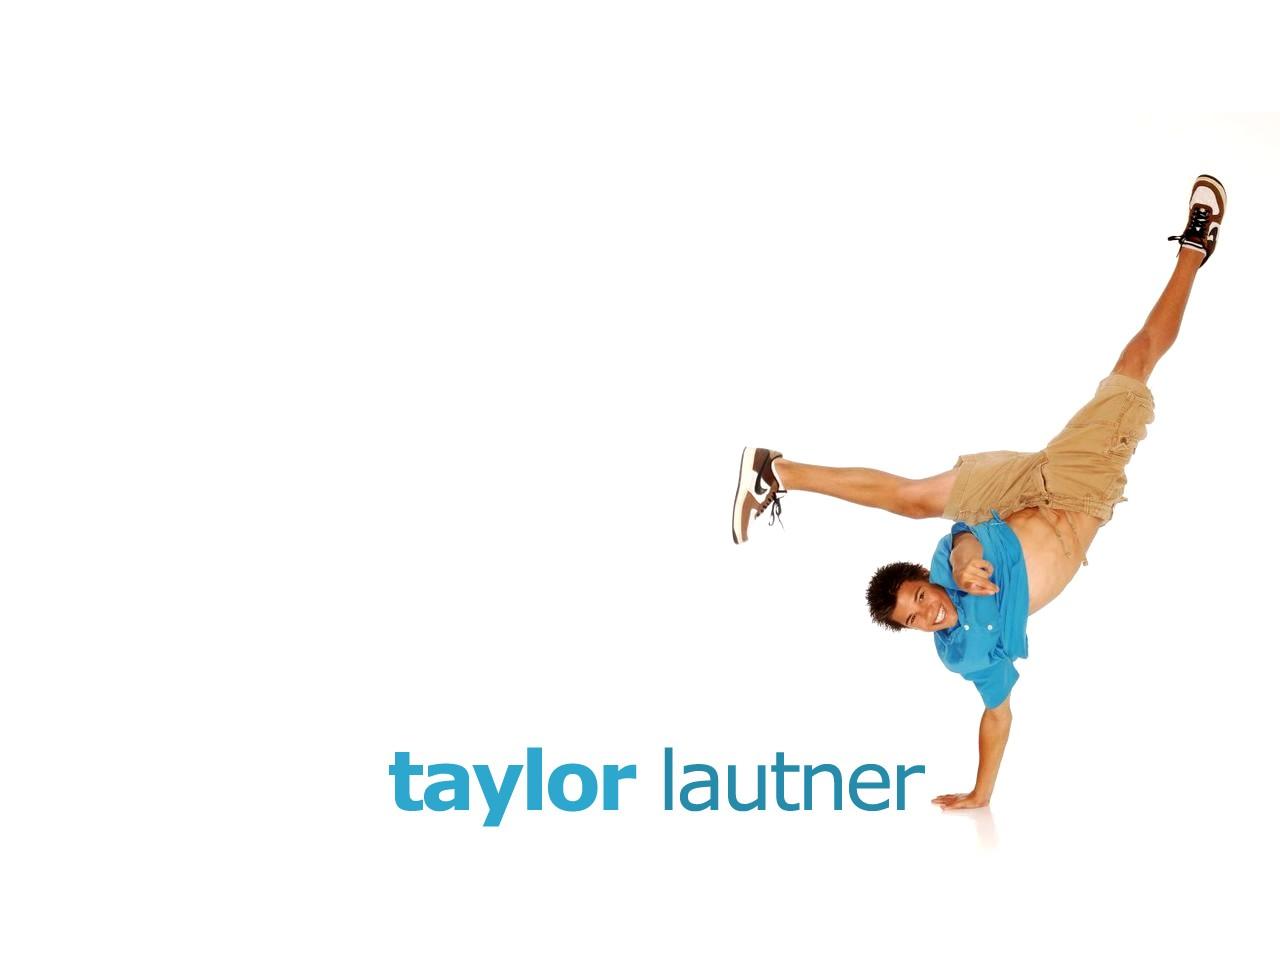 Wallpaper: addominali in vista per Taylor Lautner